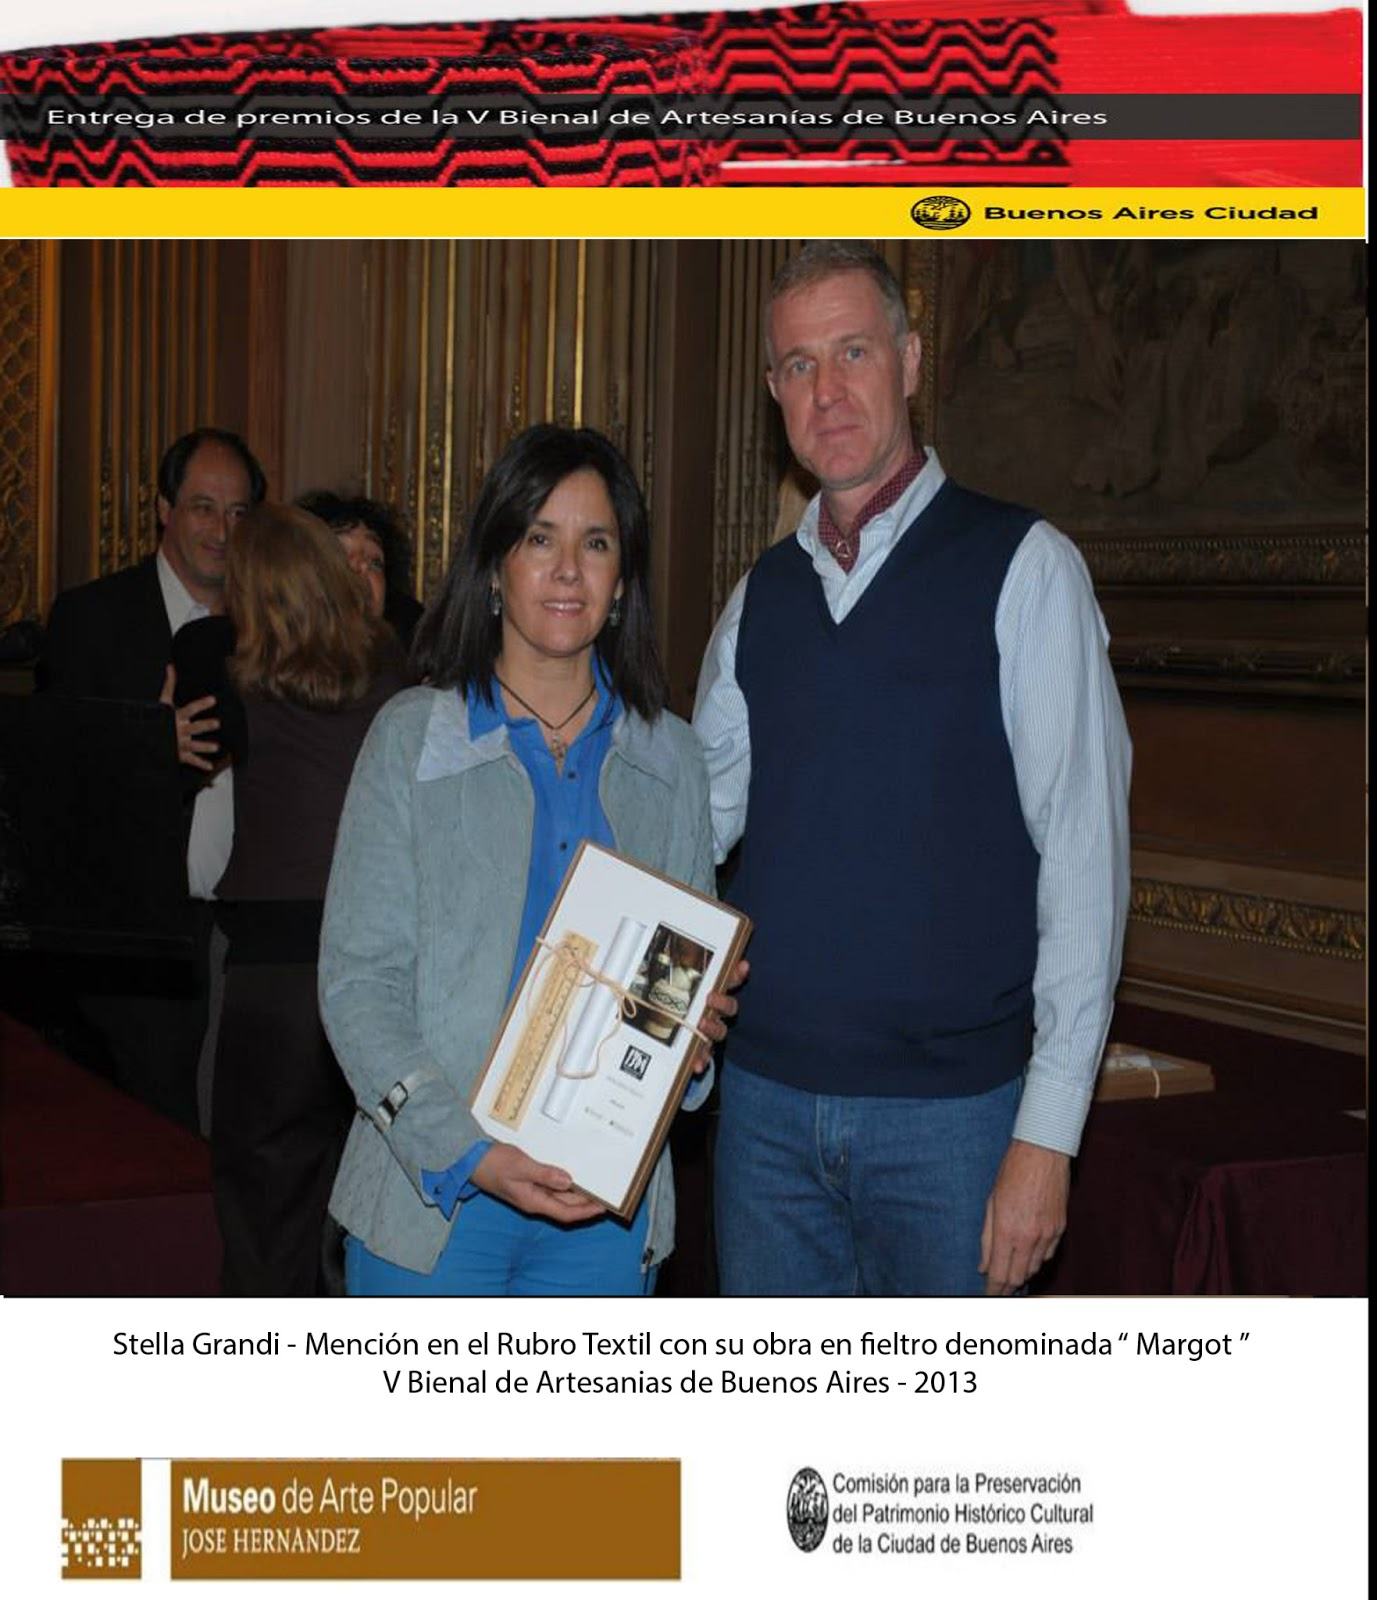 V BIENAL DE ARTESANIAS DE BUENOS AIRES 2013: ENTREGA DE PREMIOS